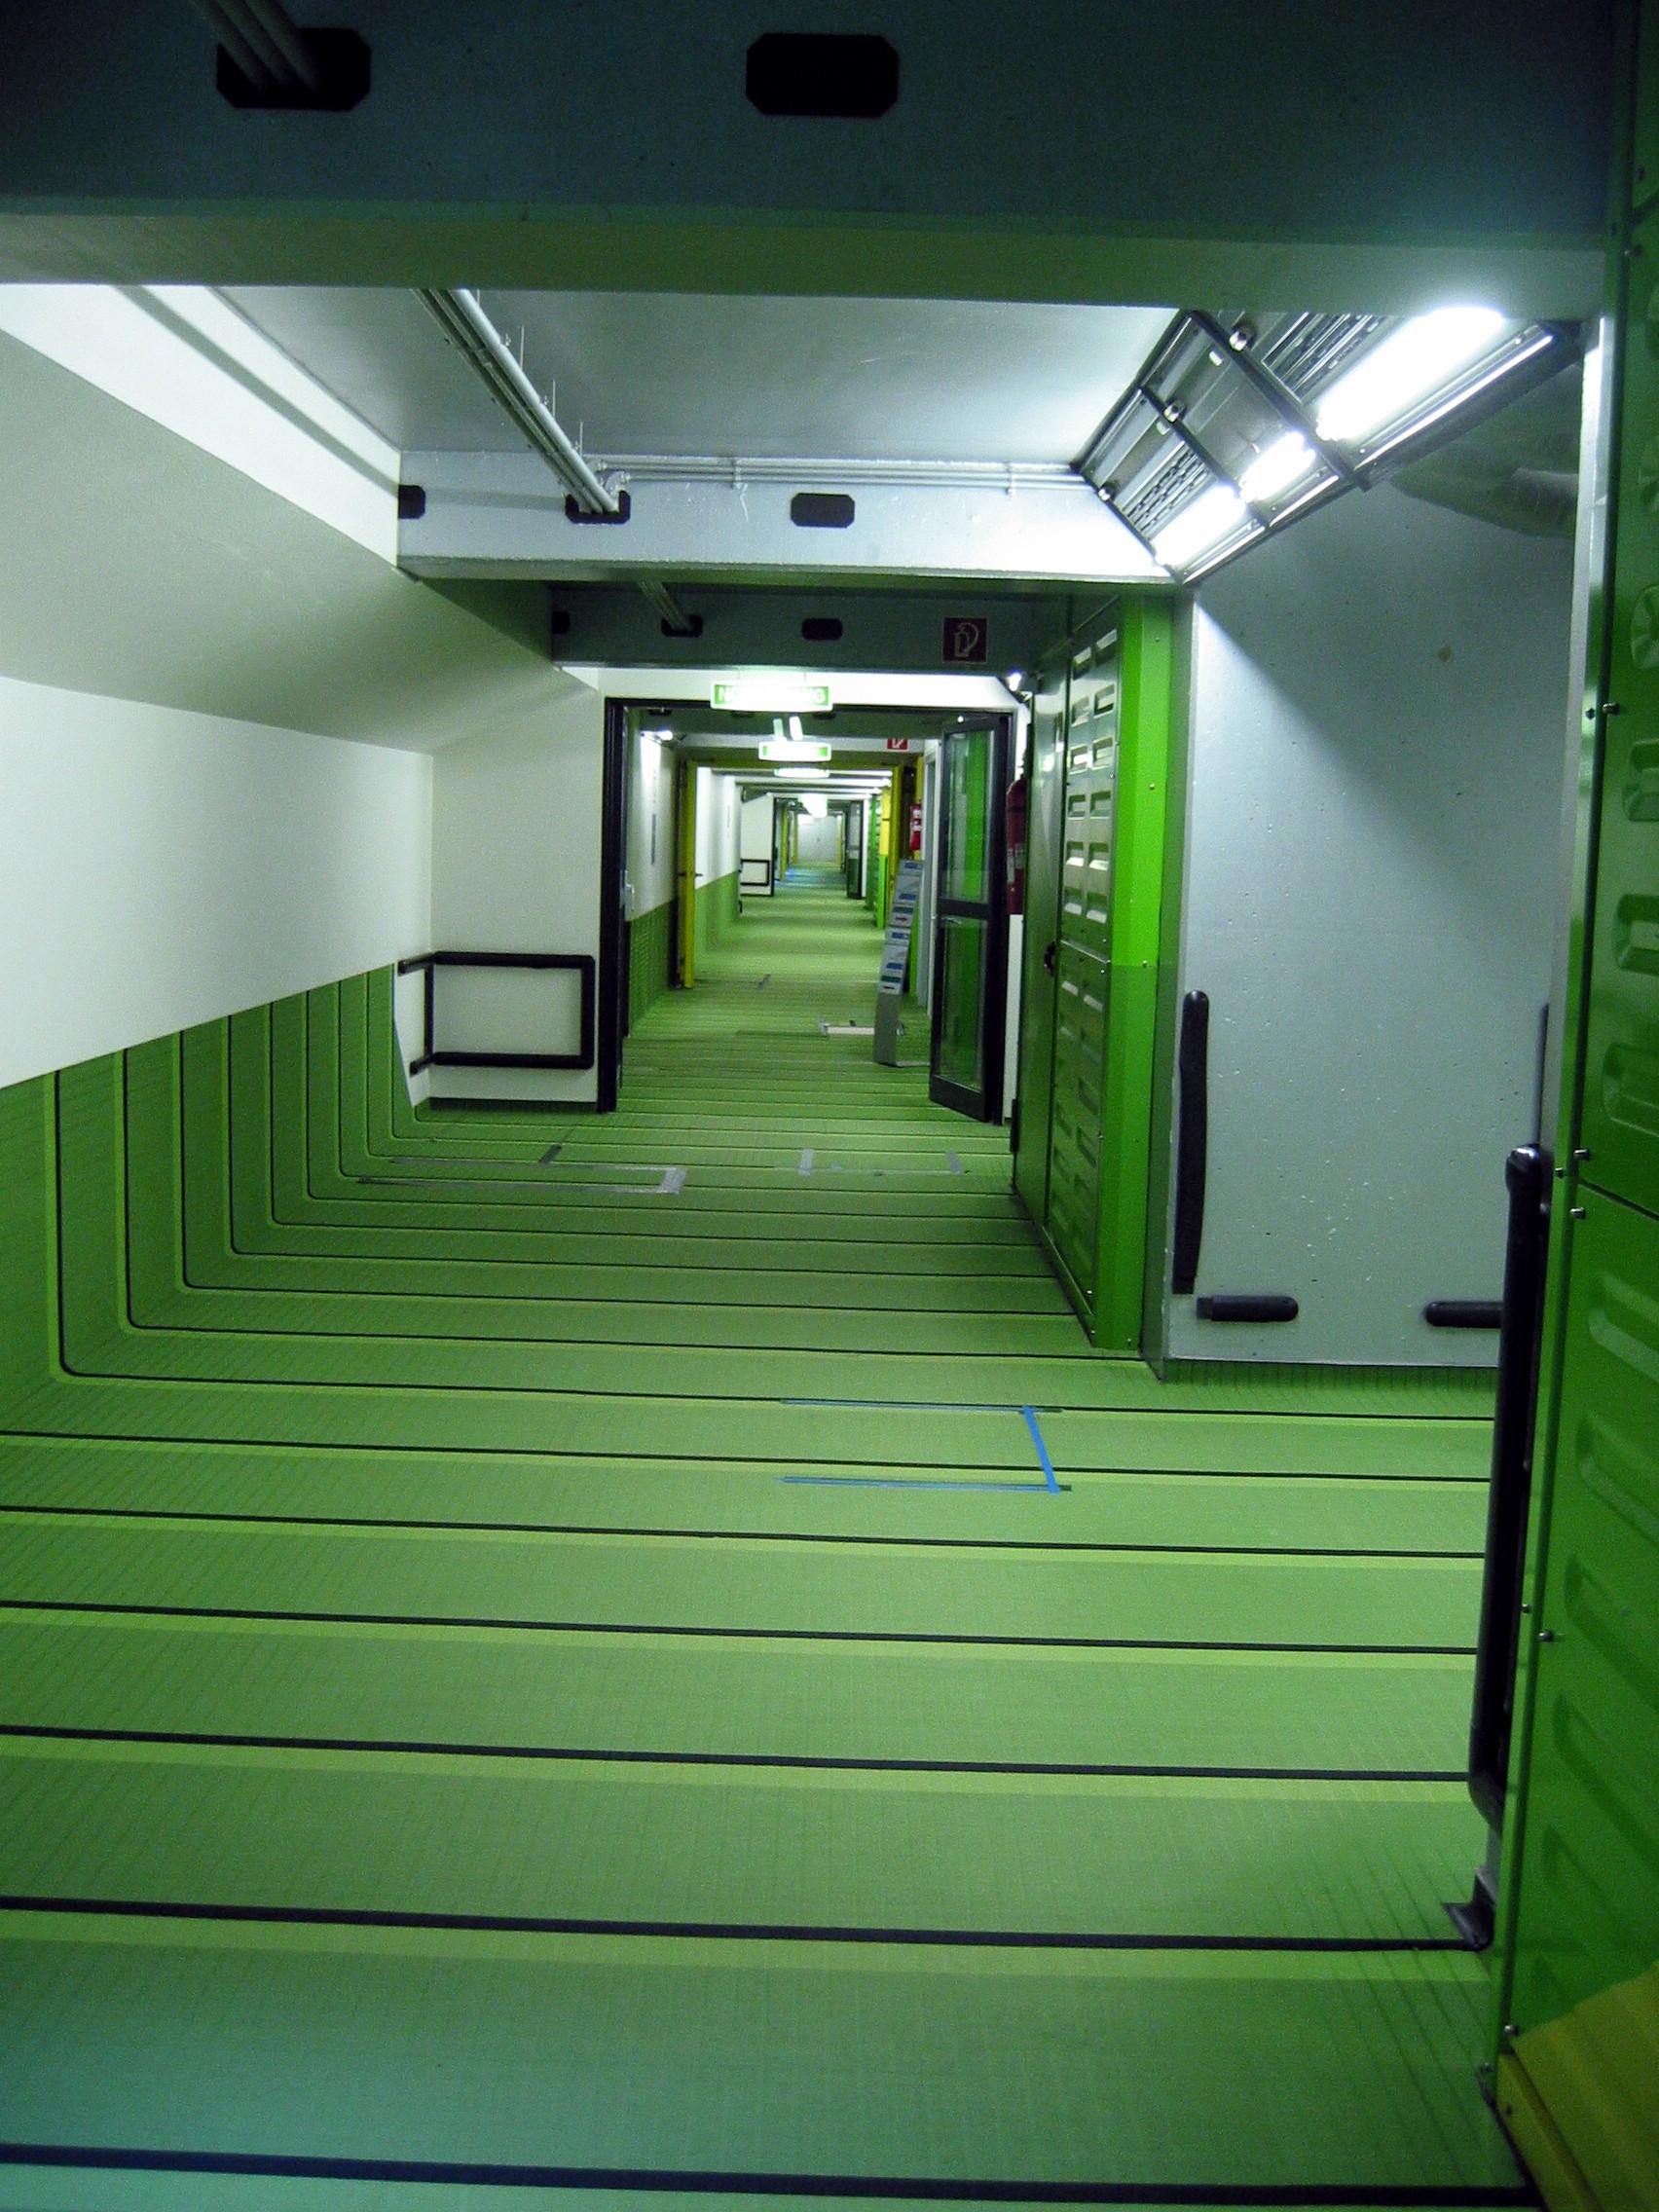 file klinikum aachen 2005 03 16 interior 1 jpg wikimedia commons. Black Bedroom Furniture Sets. Home Design Ideas